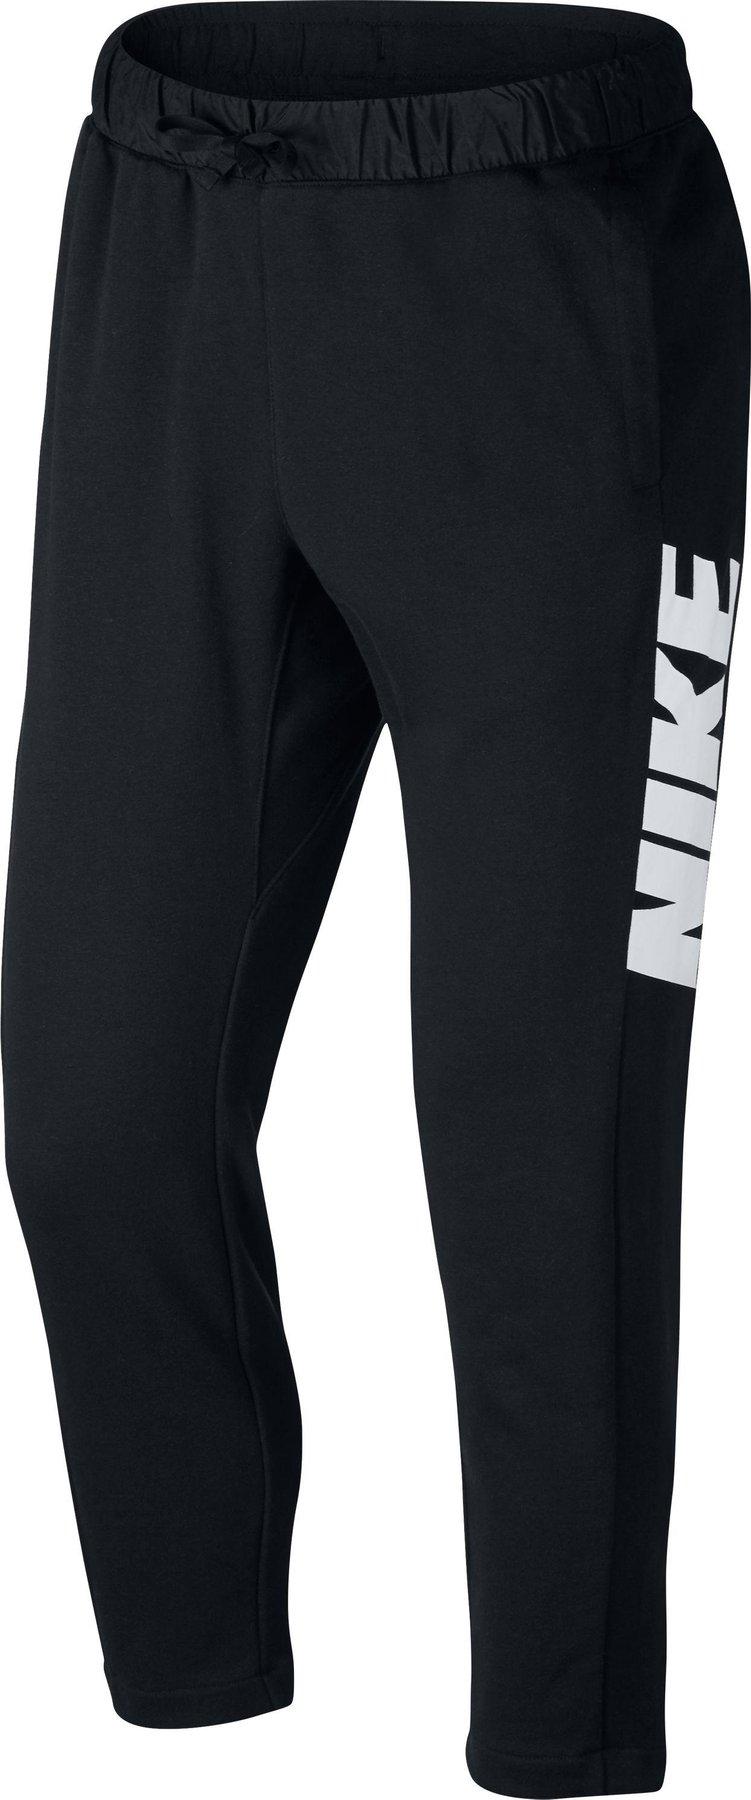 5dccb700924d2d Nike Sporthose Herren kaufen